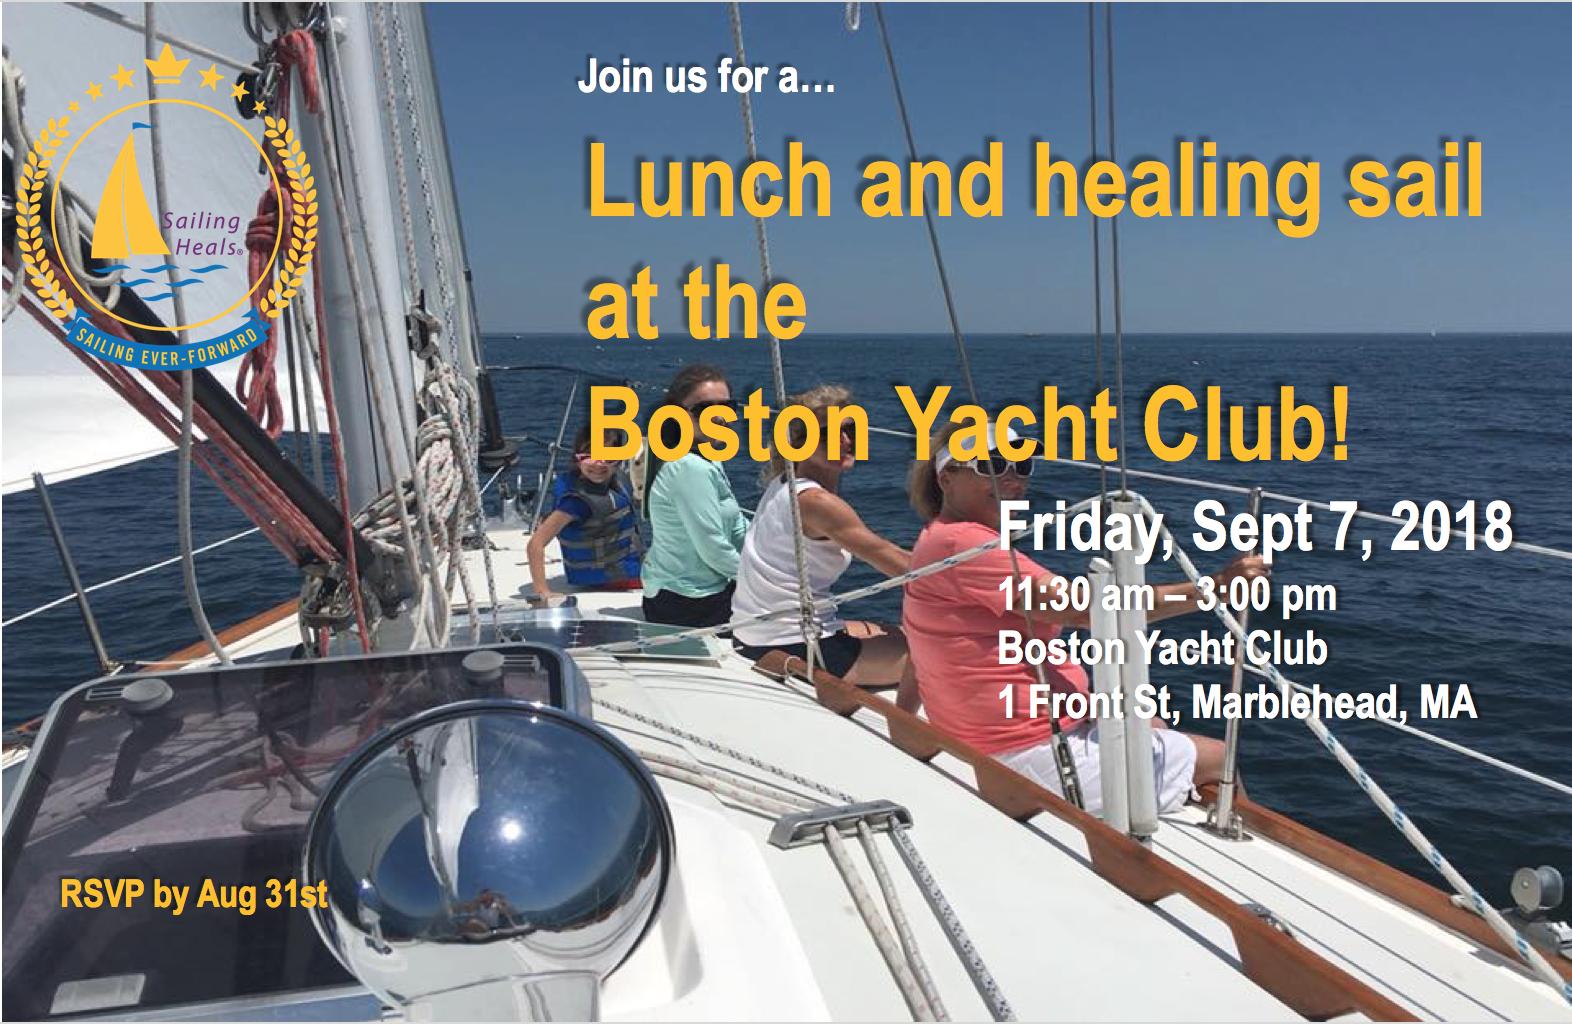 9/7/18 Boston Yacht Club Healing Sail